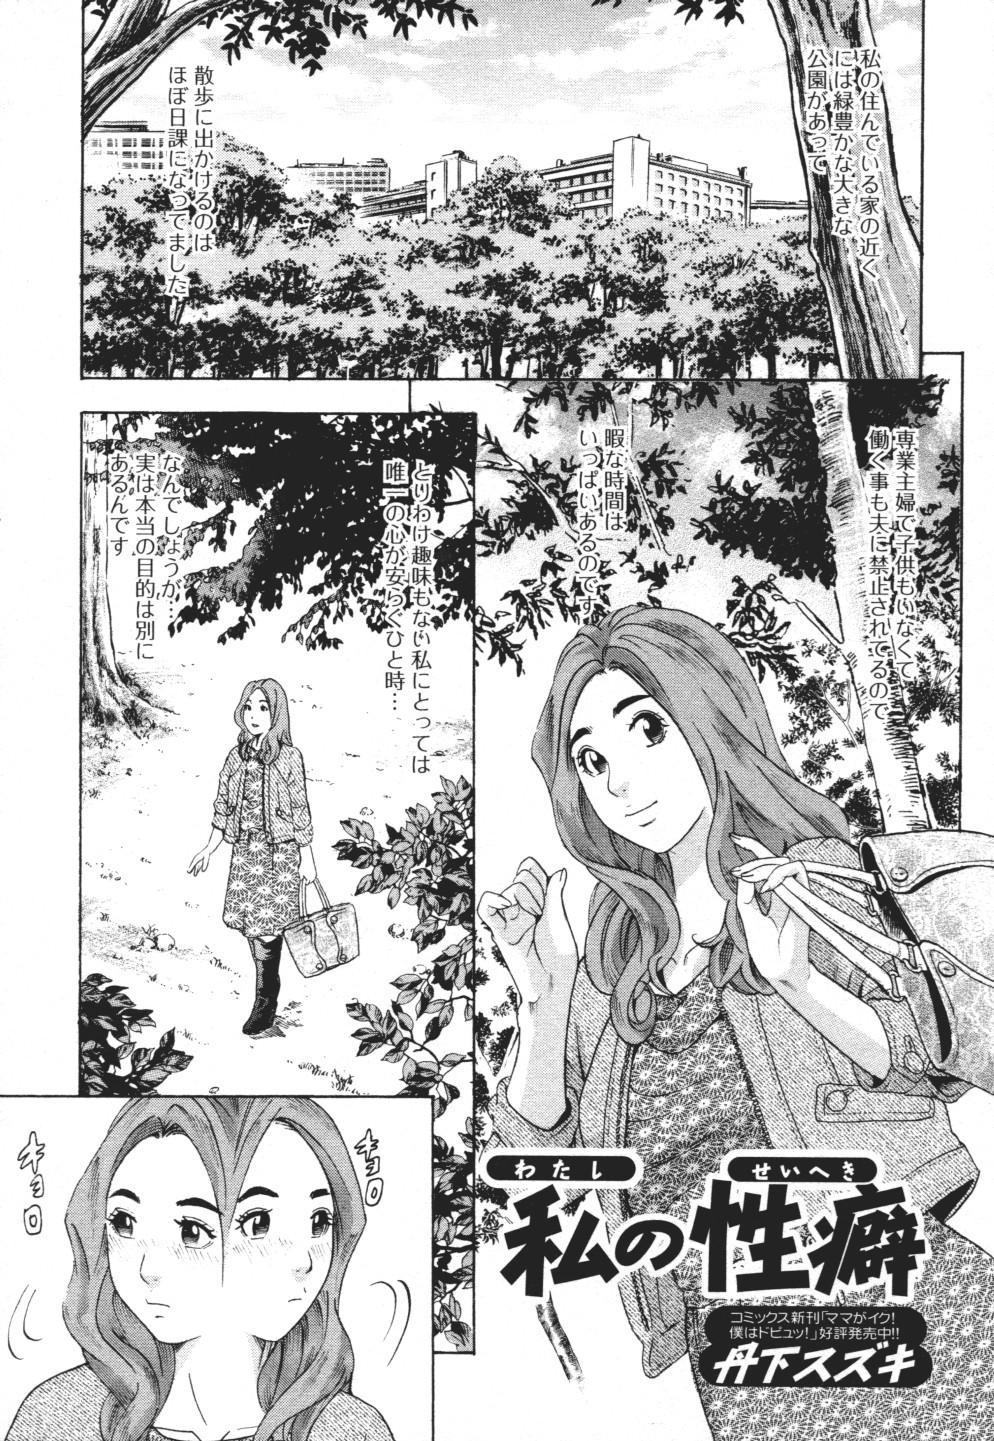 Nozoite wa Ikenai 3 - Do Not Peep! 3 21